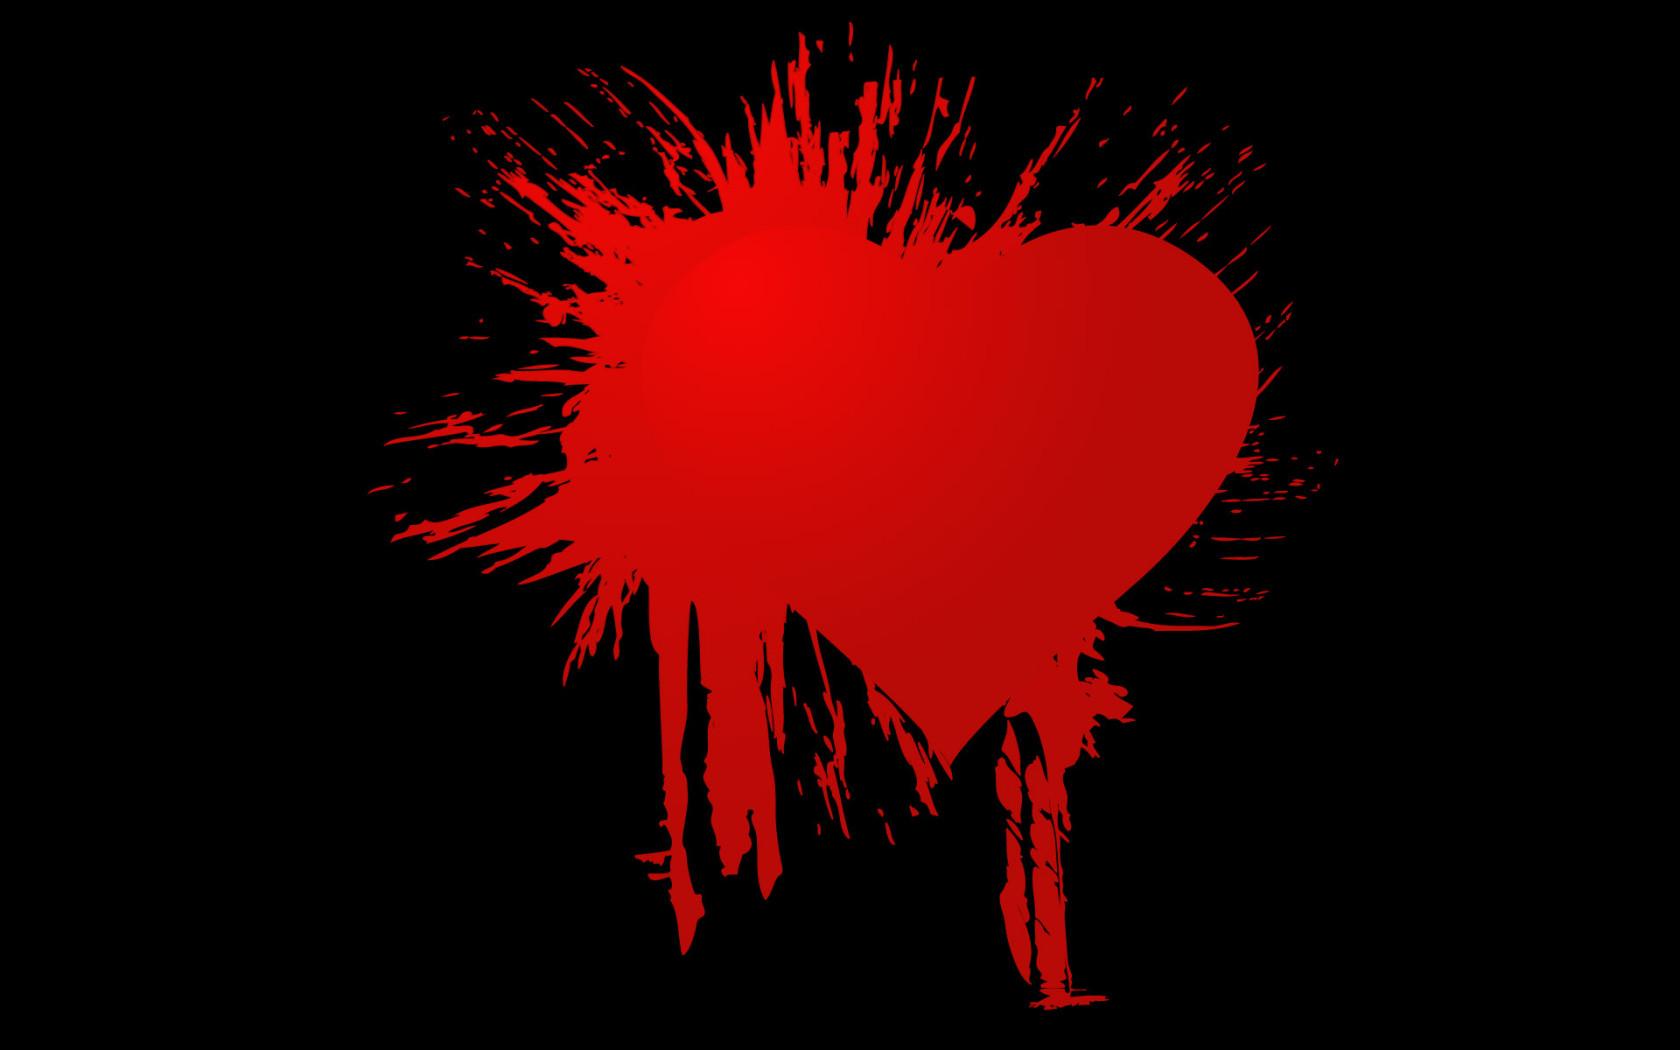 Previous, Holidays - Saint Valentines Day - Broken Heart wallpaper